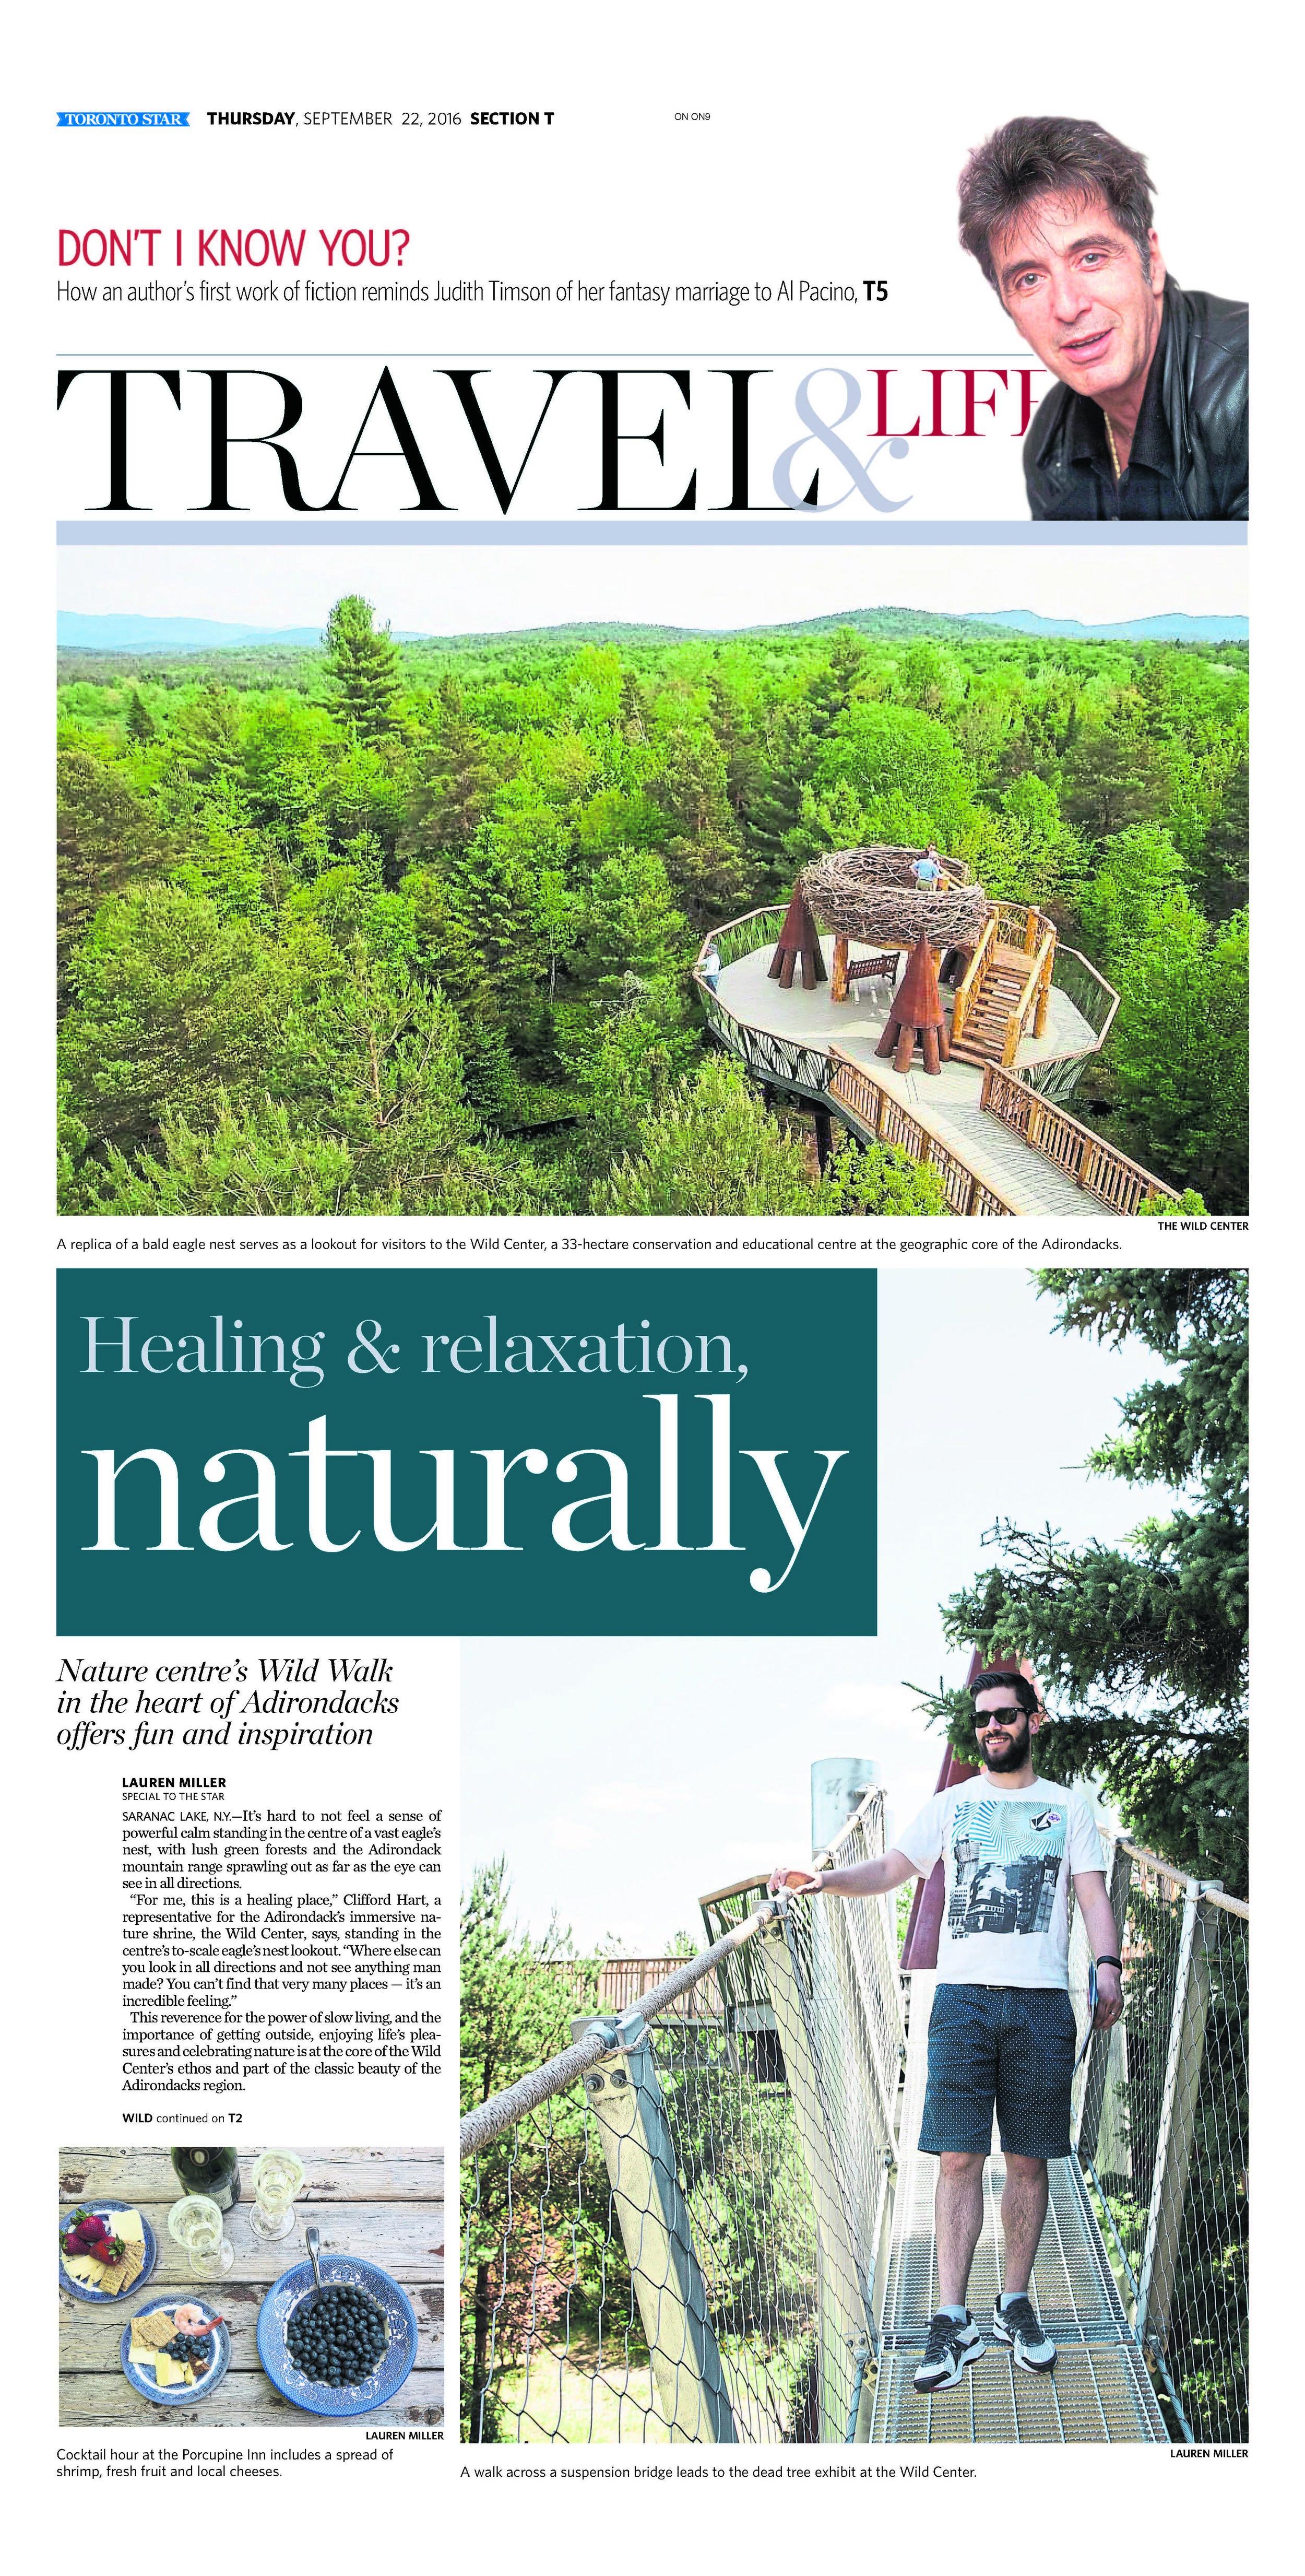 LaurenMiller_Commercial_Editorial_Photographer_Toronto_Travel_Adirondacks2.jpg